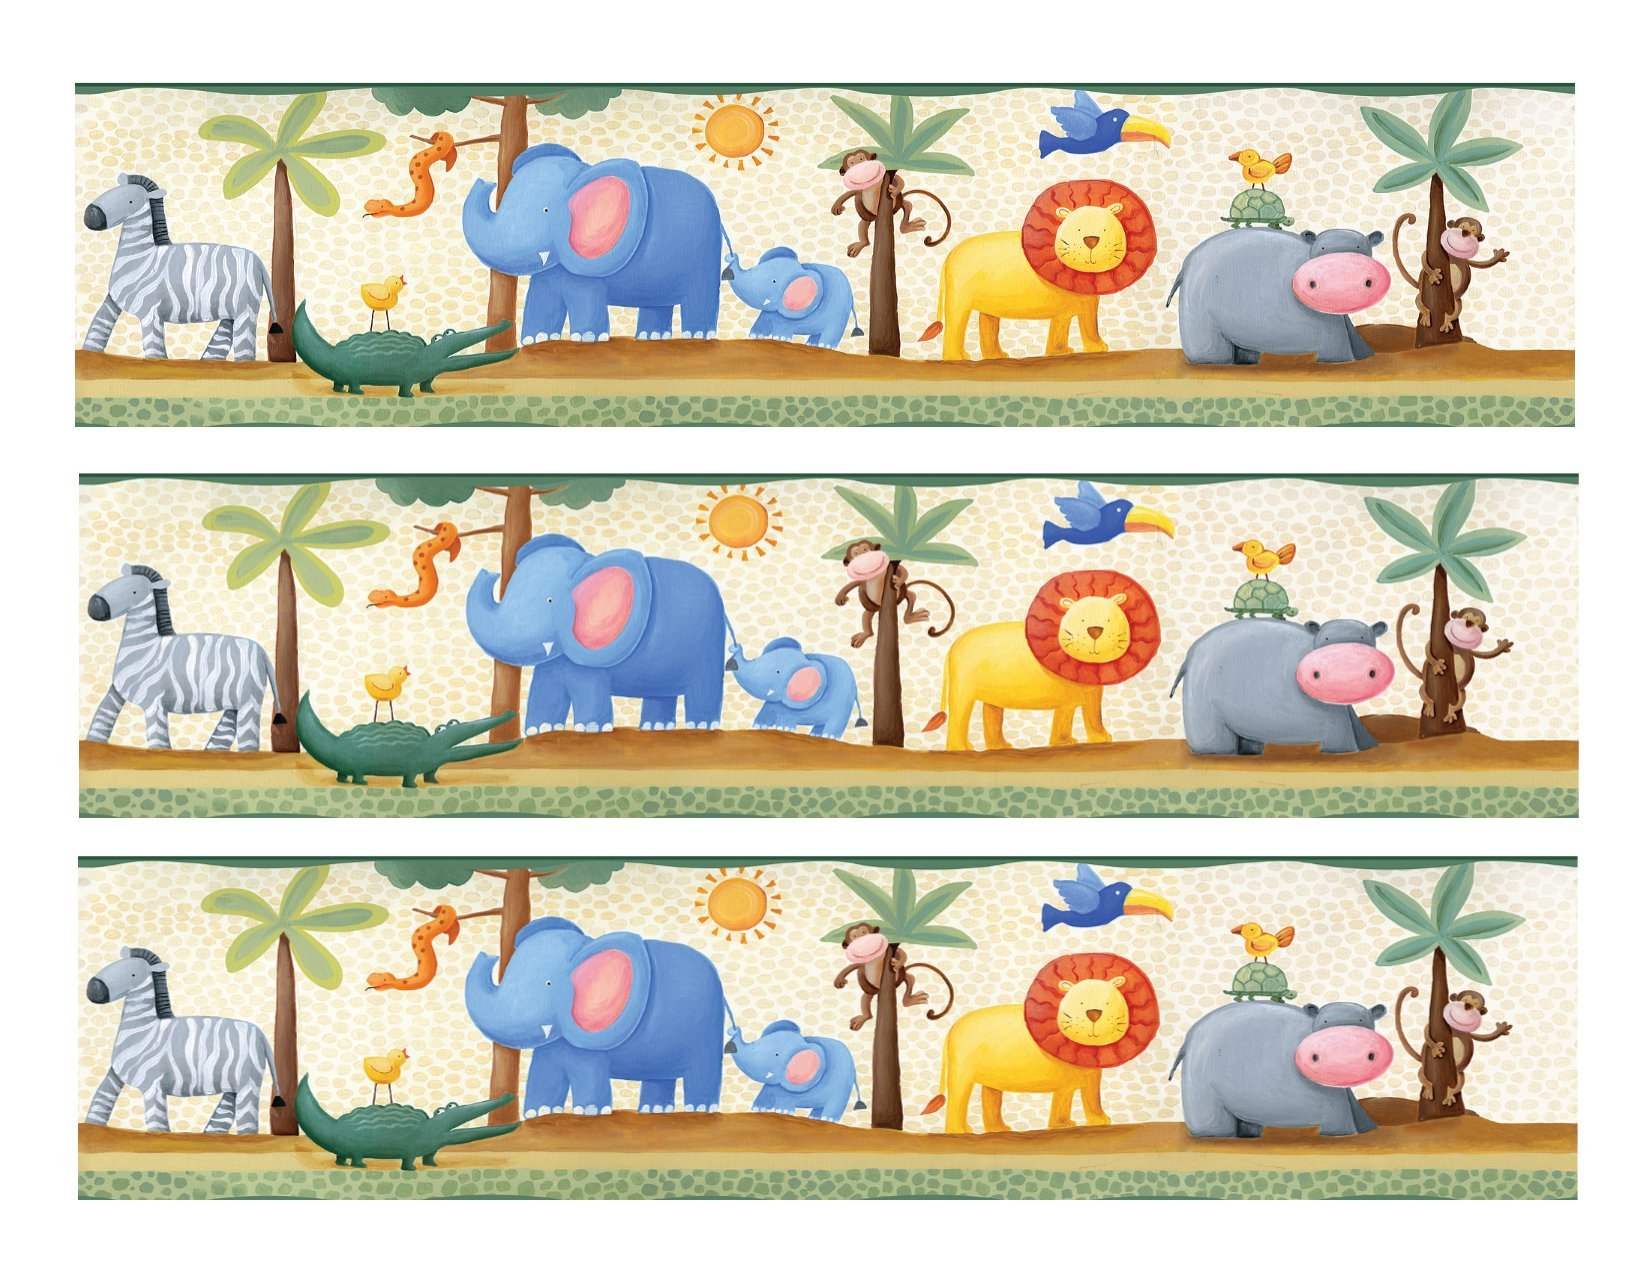 Jungle Animals cake Edible Icing Image border strips (3 Strips)